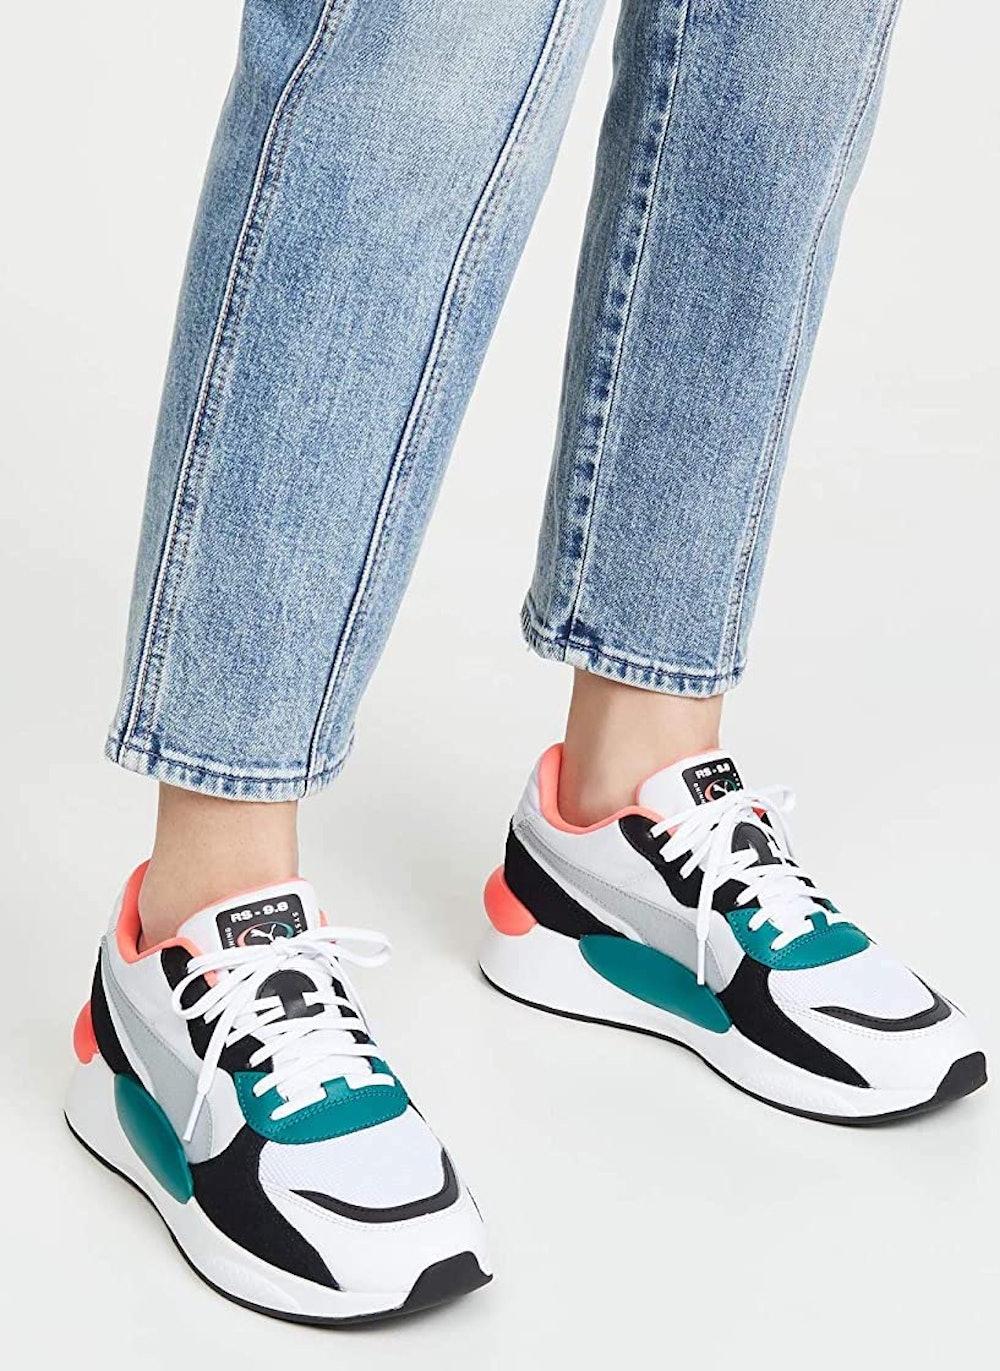 PUMA Women's Space Sneakers